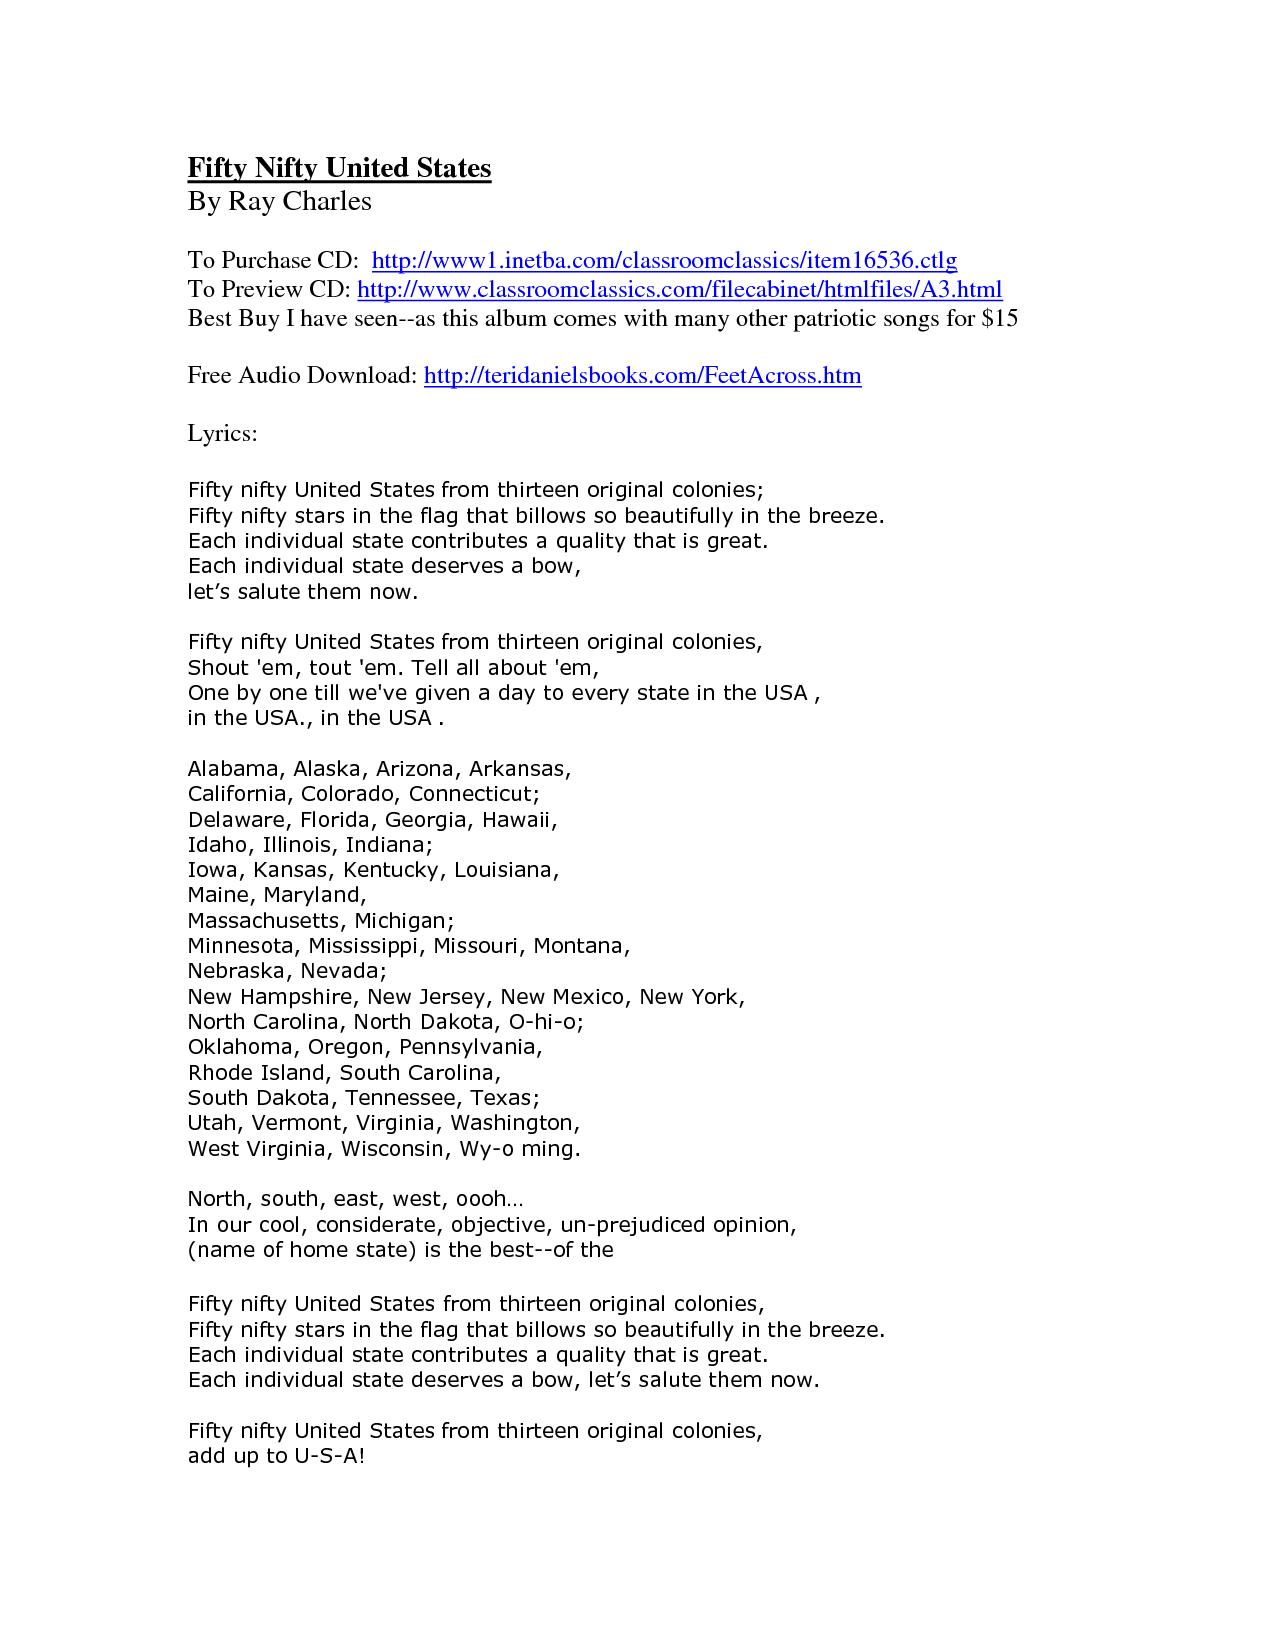 50 Nifty United States lyrics and websites CCA CK 2nd